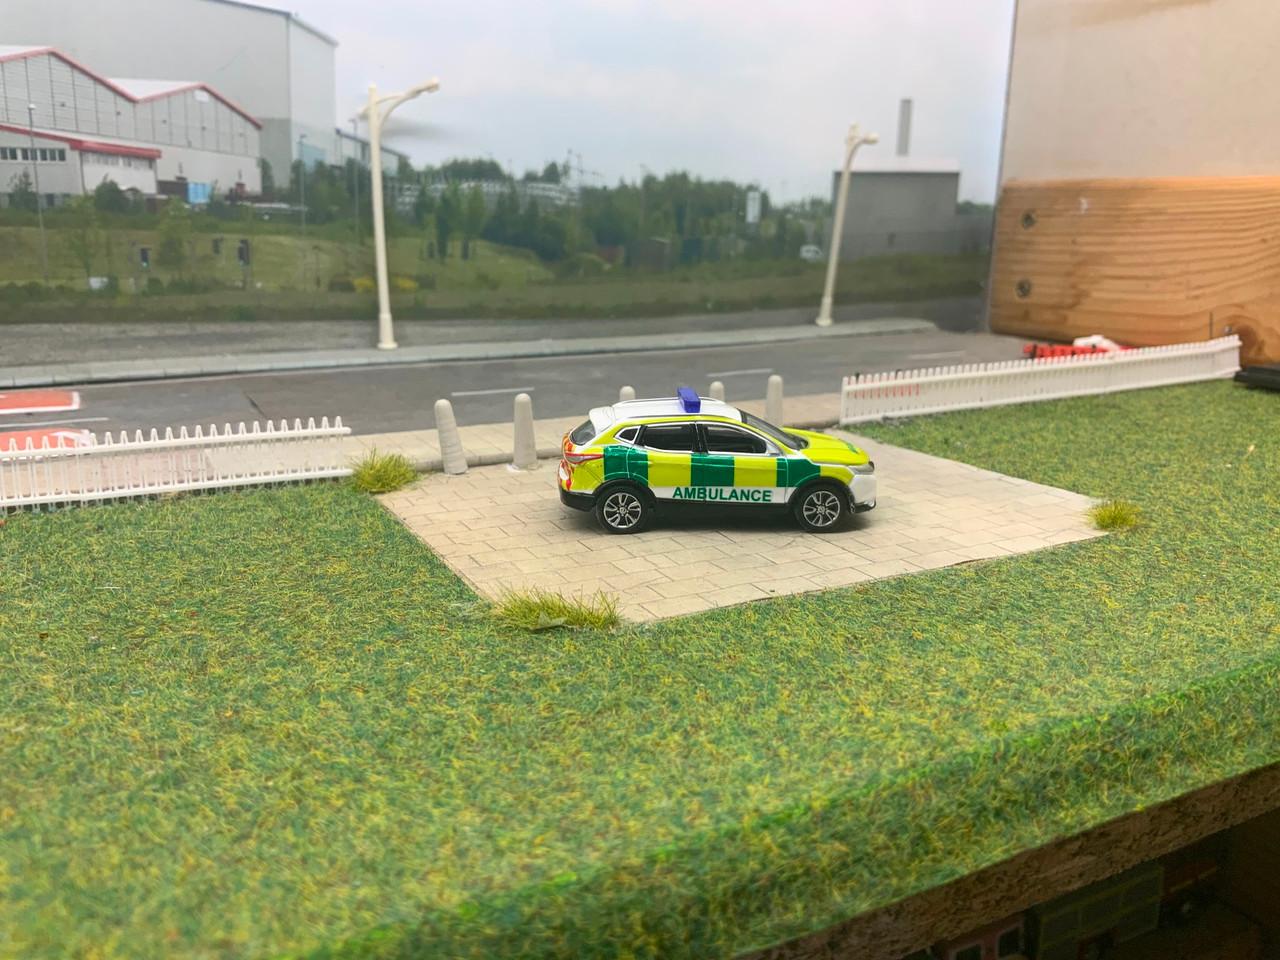 1:76 Code 3 Nissan Qashqai Ambulance rapid response (White)